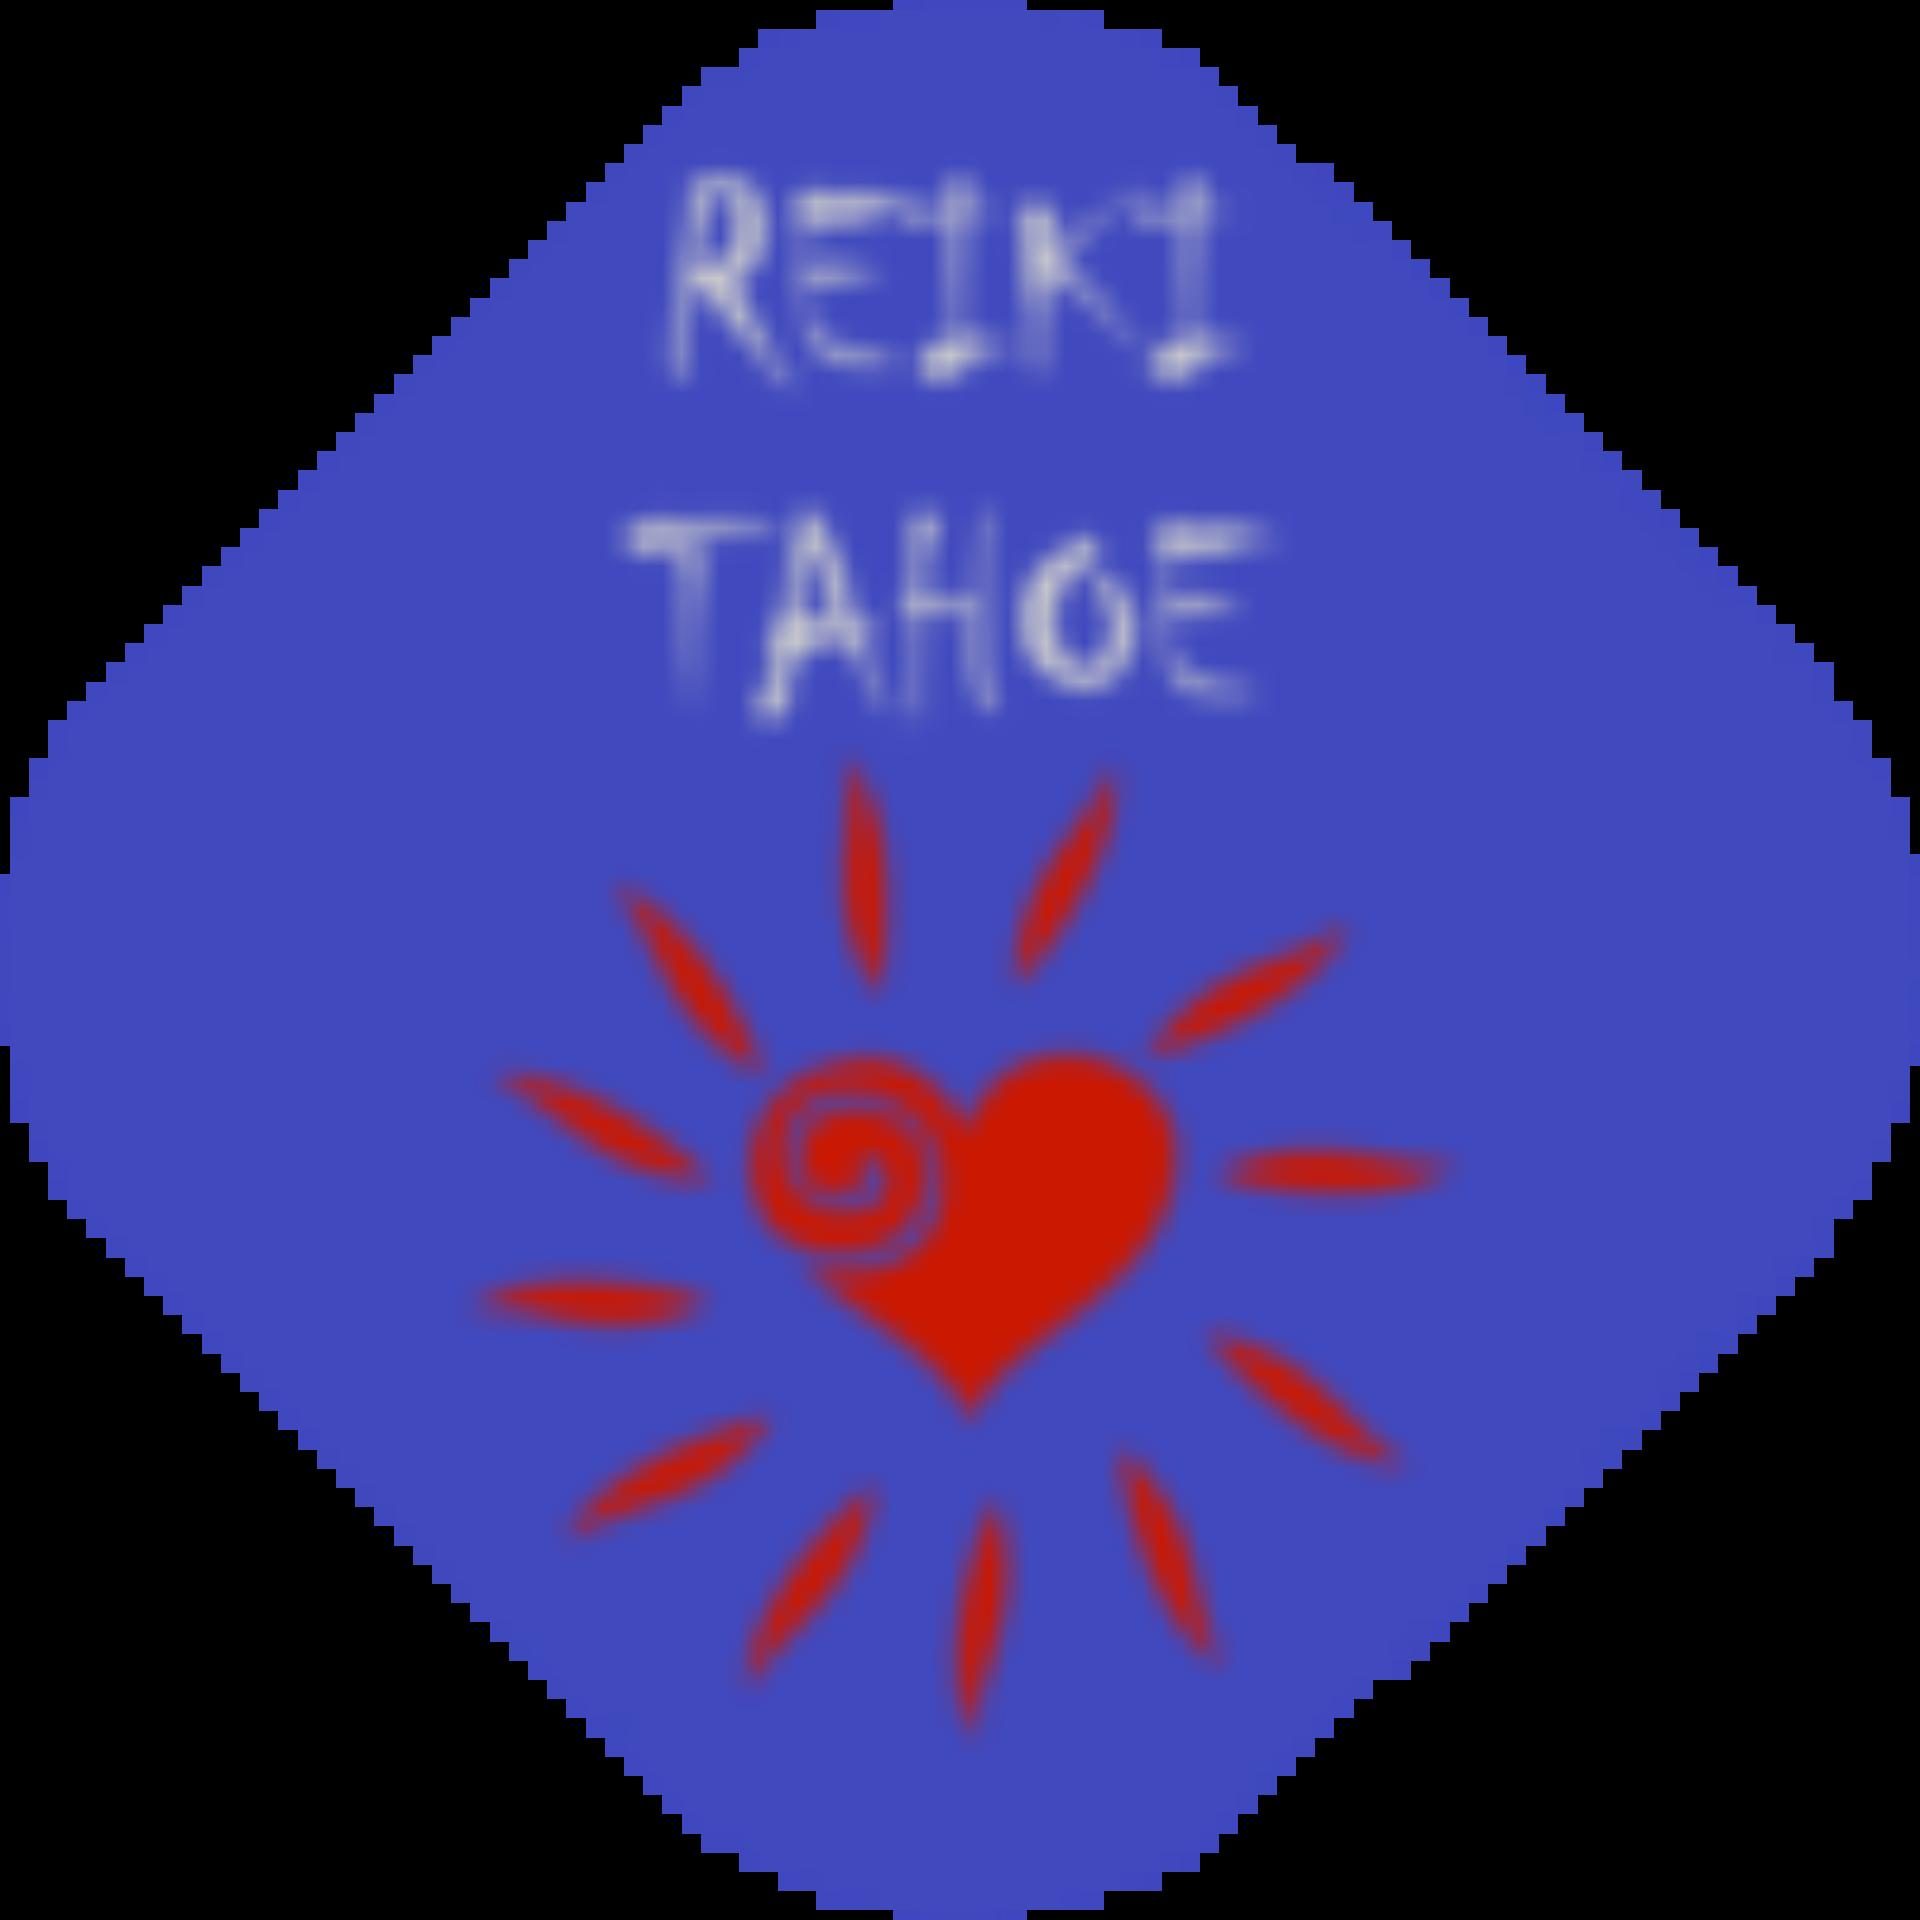 Reiki Tahoe